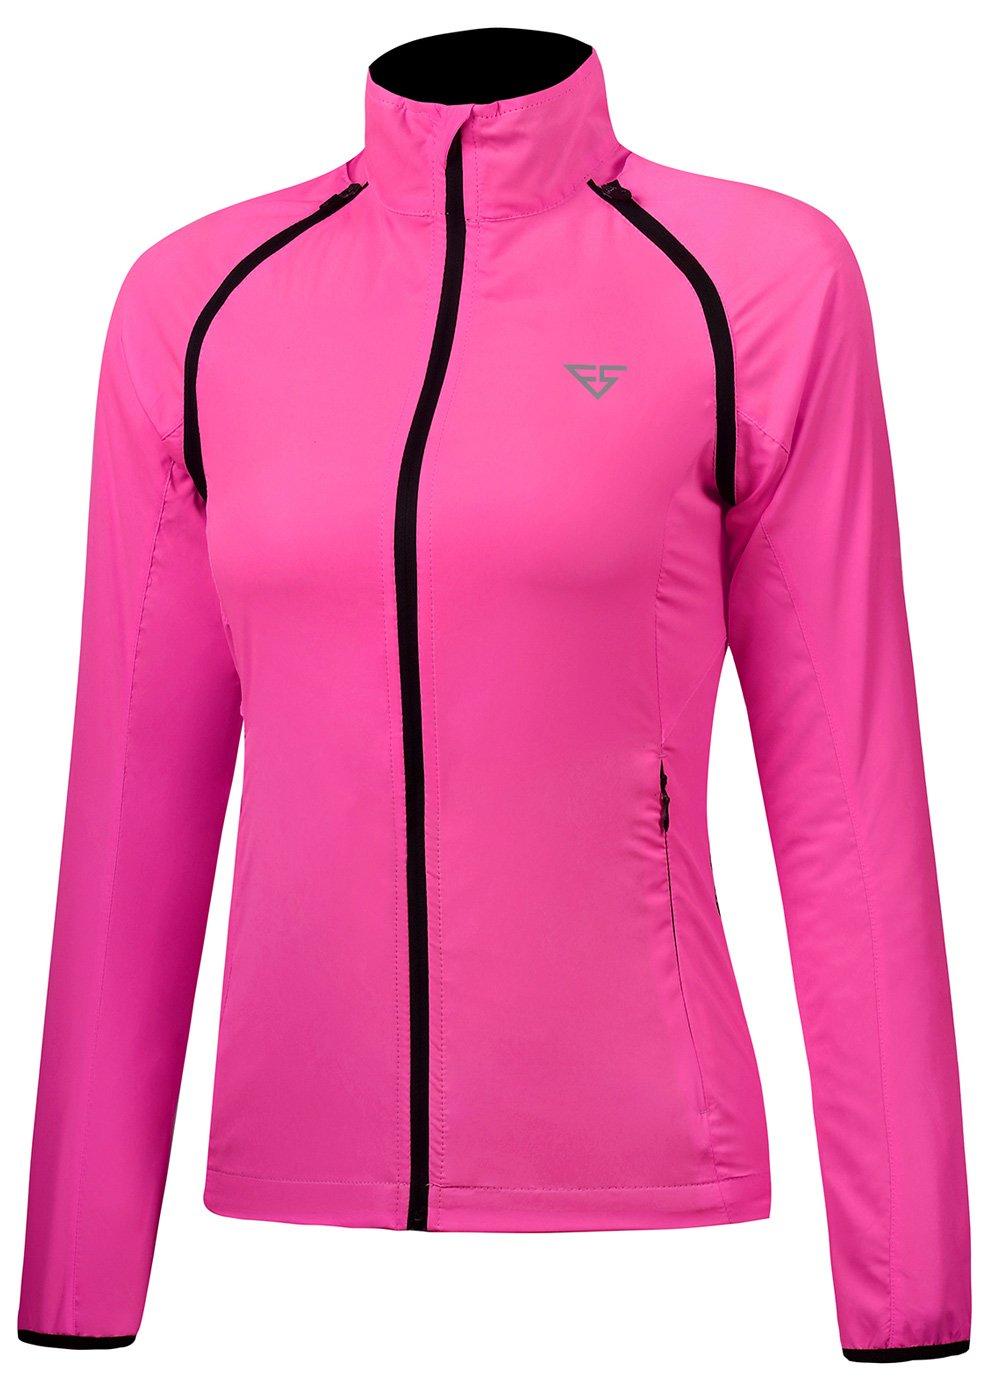 Fastorm Convertible Cycling Jacket Women's Windproof Lightweight Running Outdoor Sportwear Water Resistant Rose Red-L